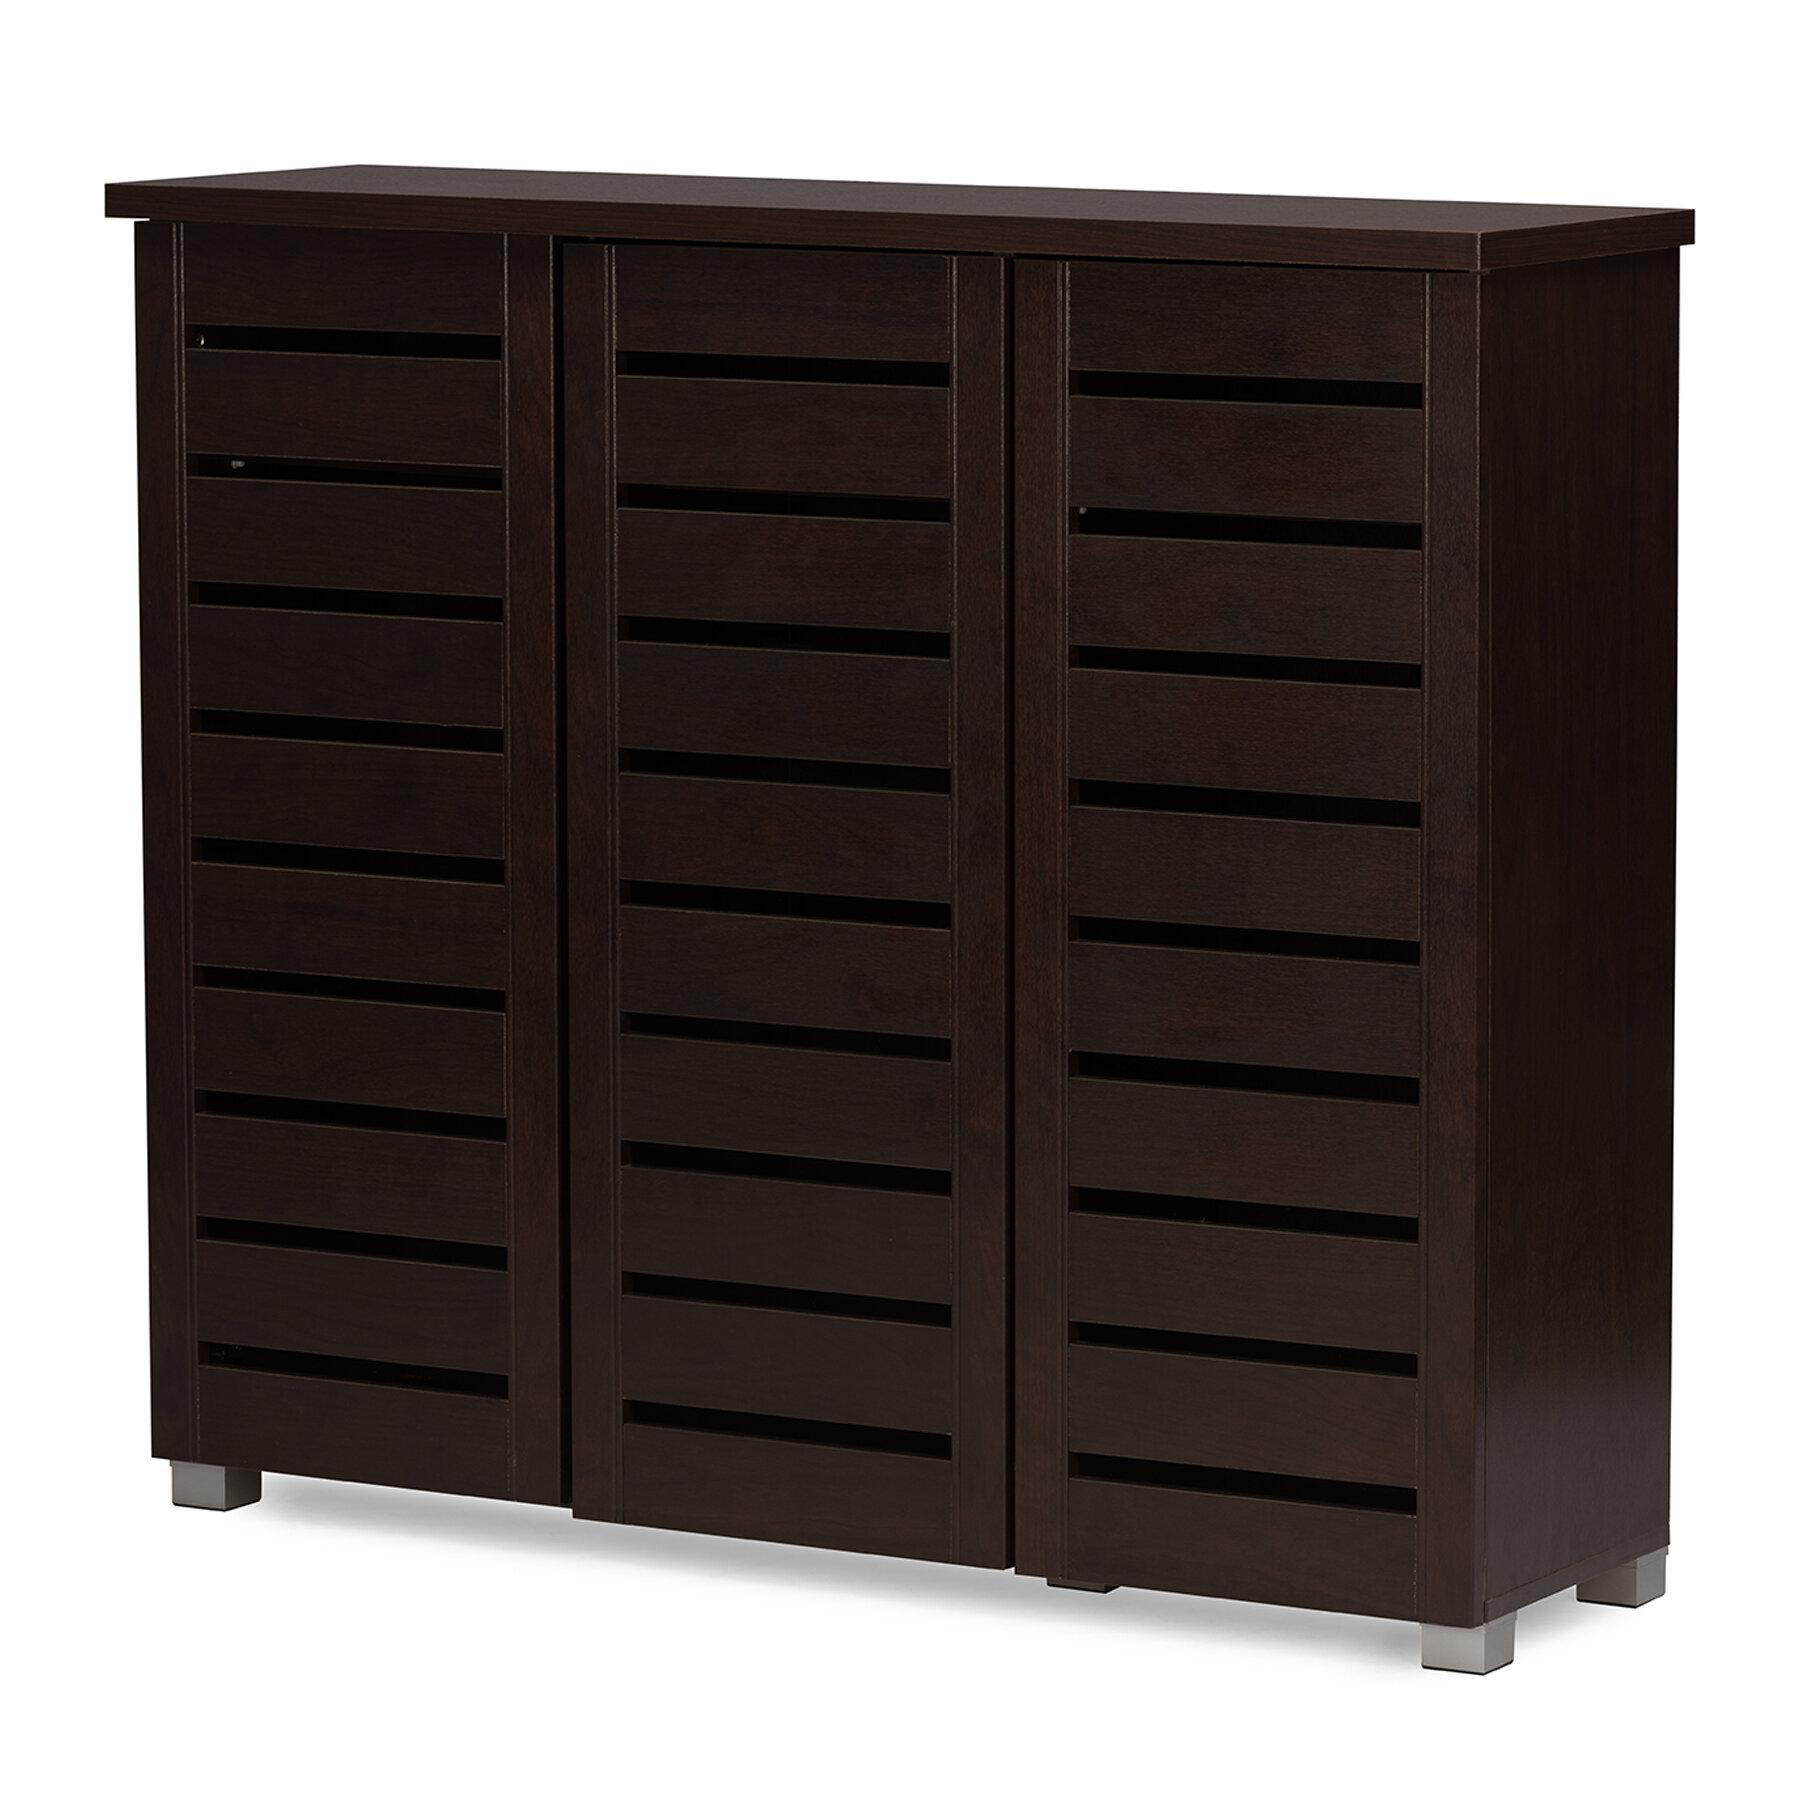 Ostrowski 20 Pair Shoe Storage Cabinet Reviews Birch Lane